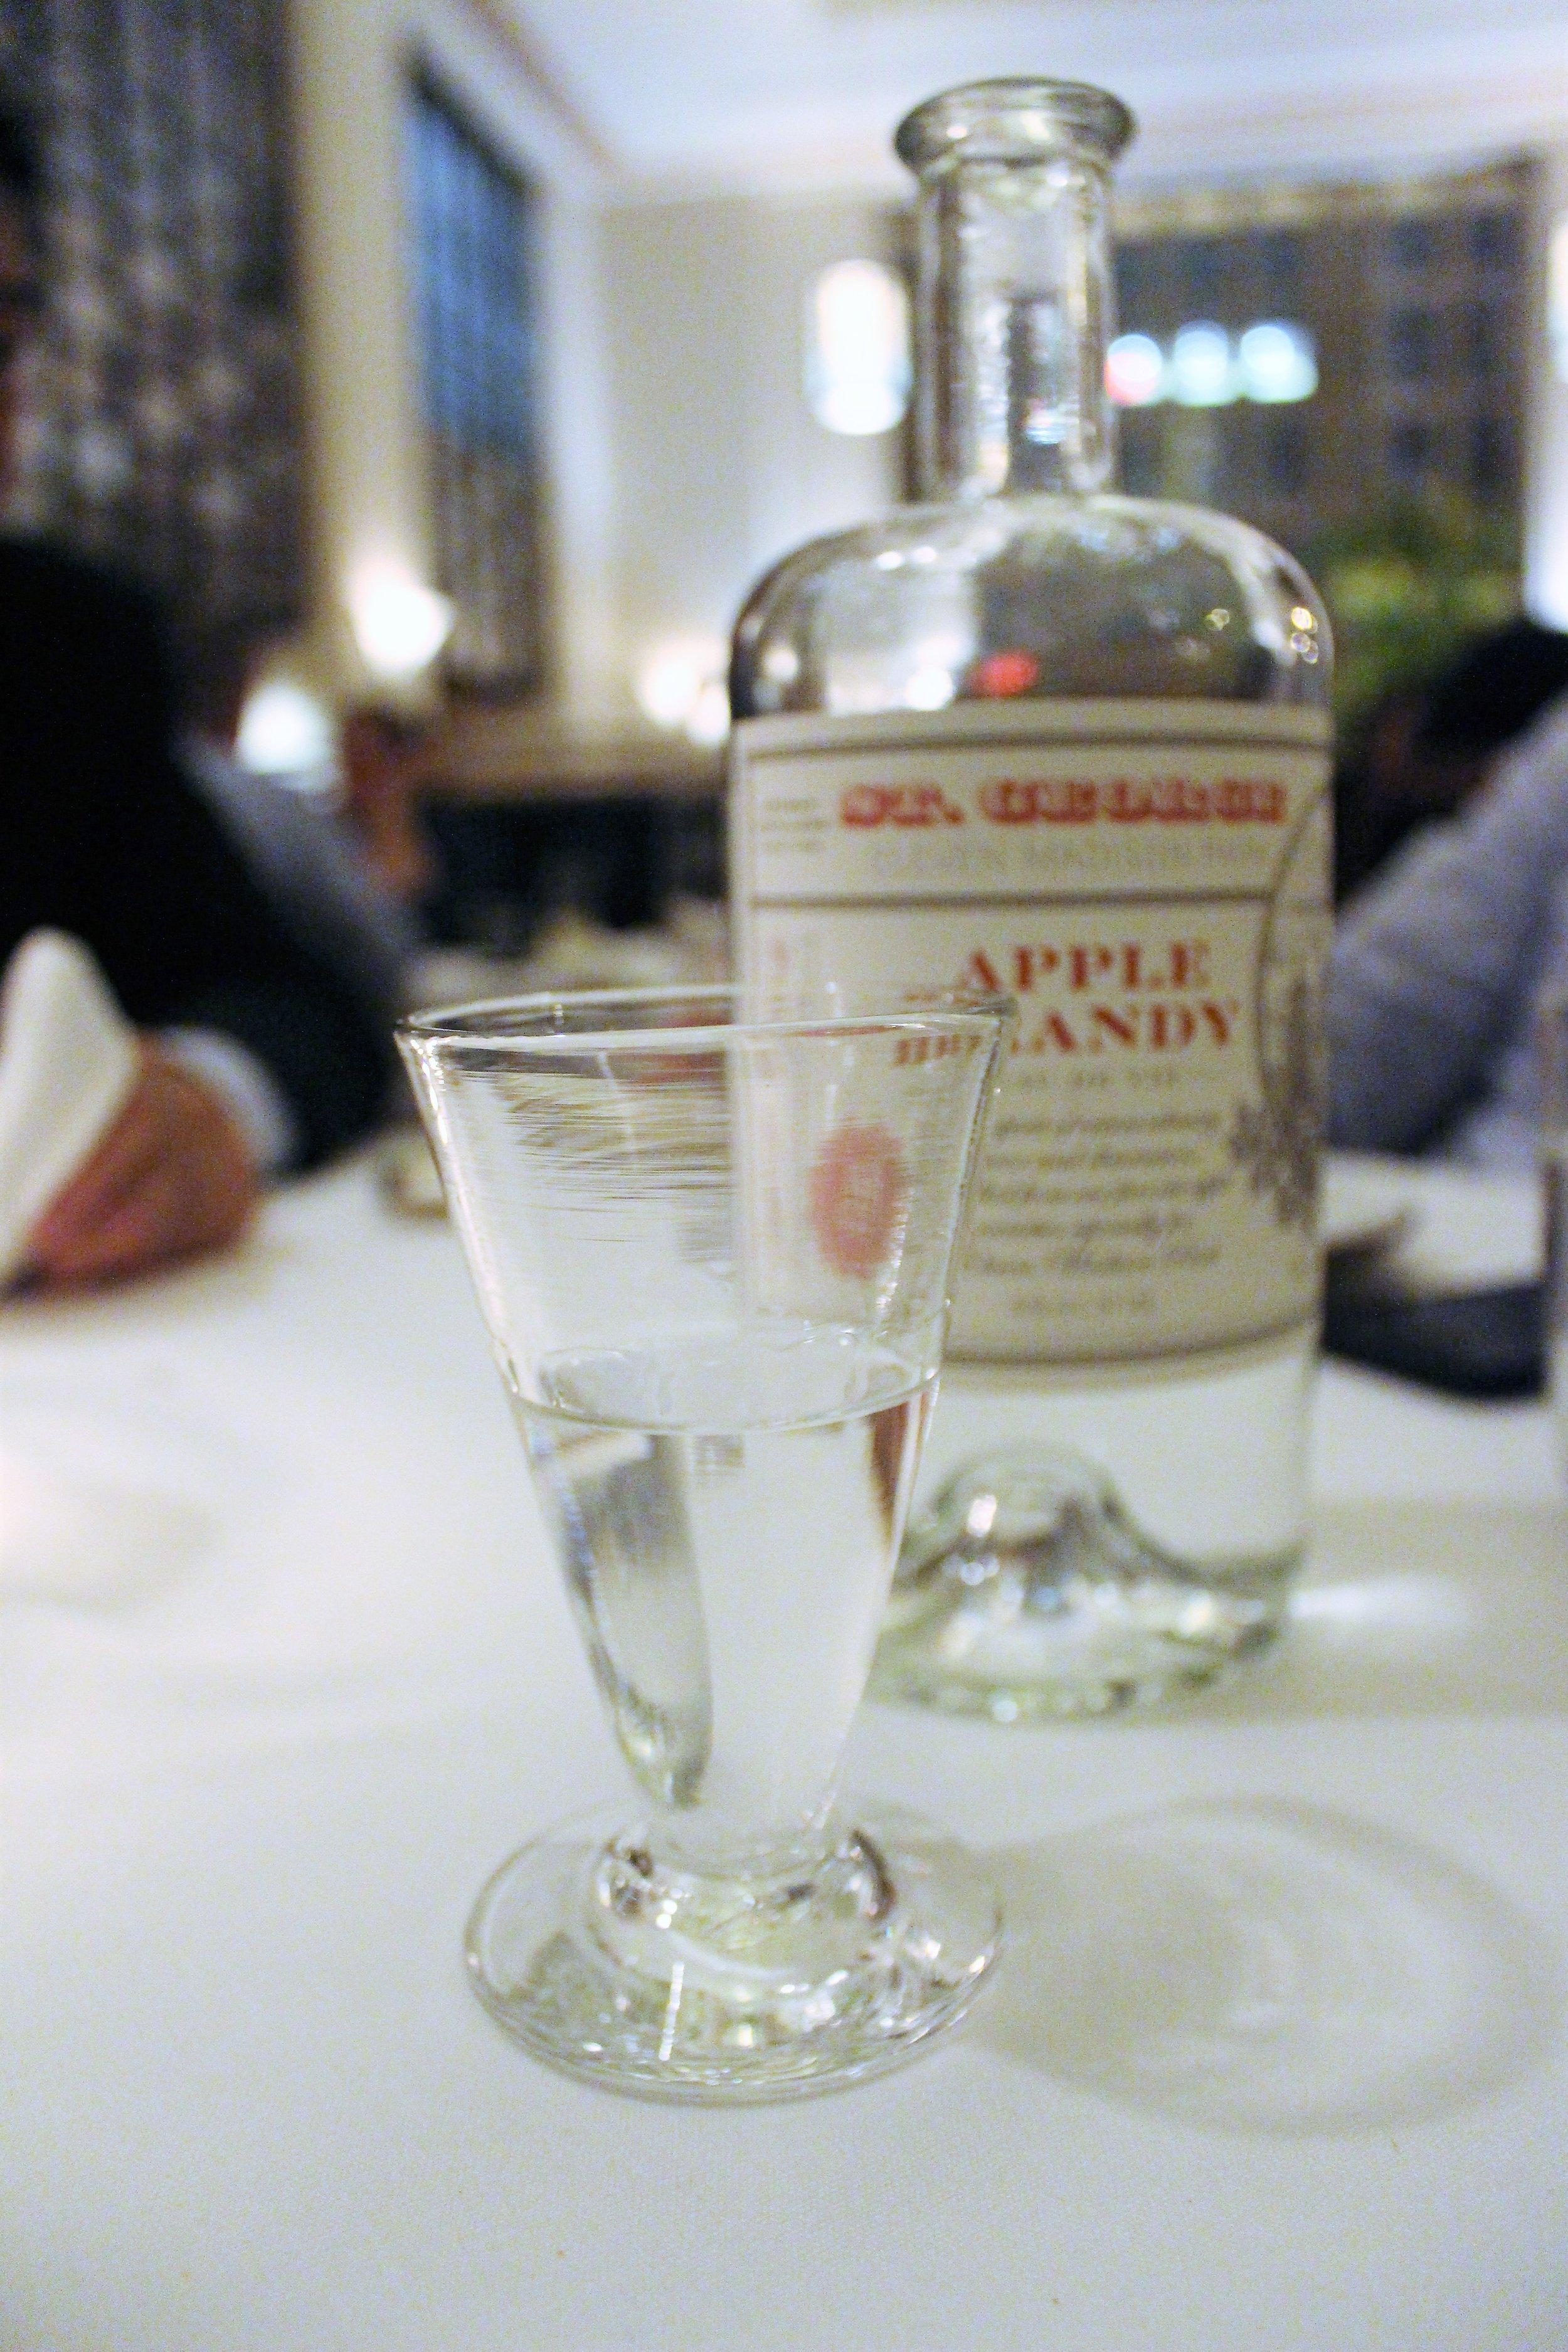 St-George-Apple-Brandy-at-Eleven-Madison-Park.JPG